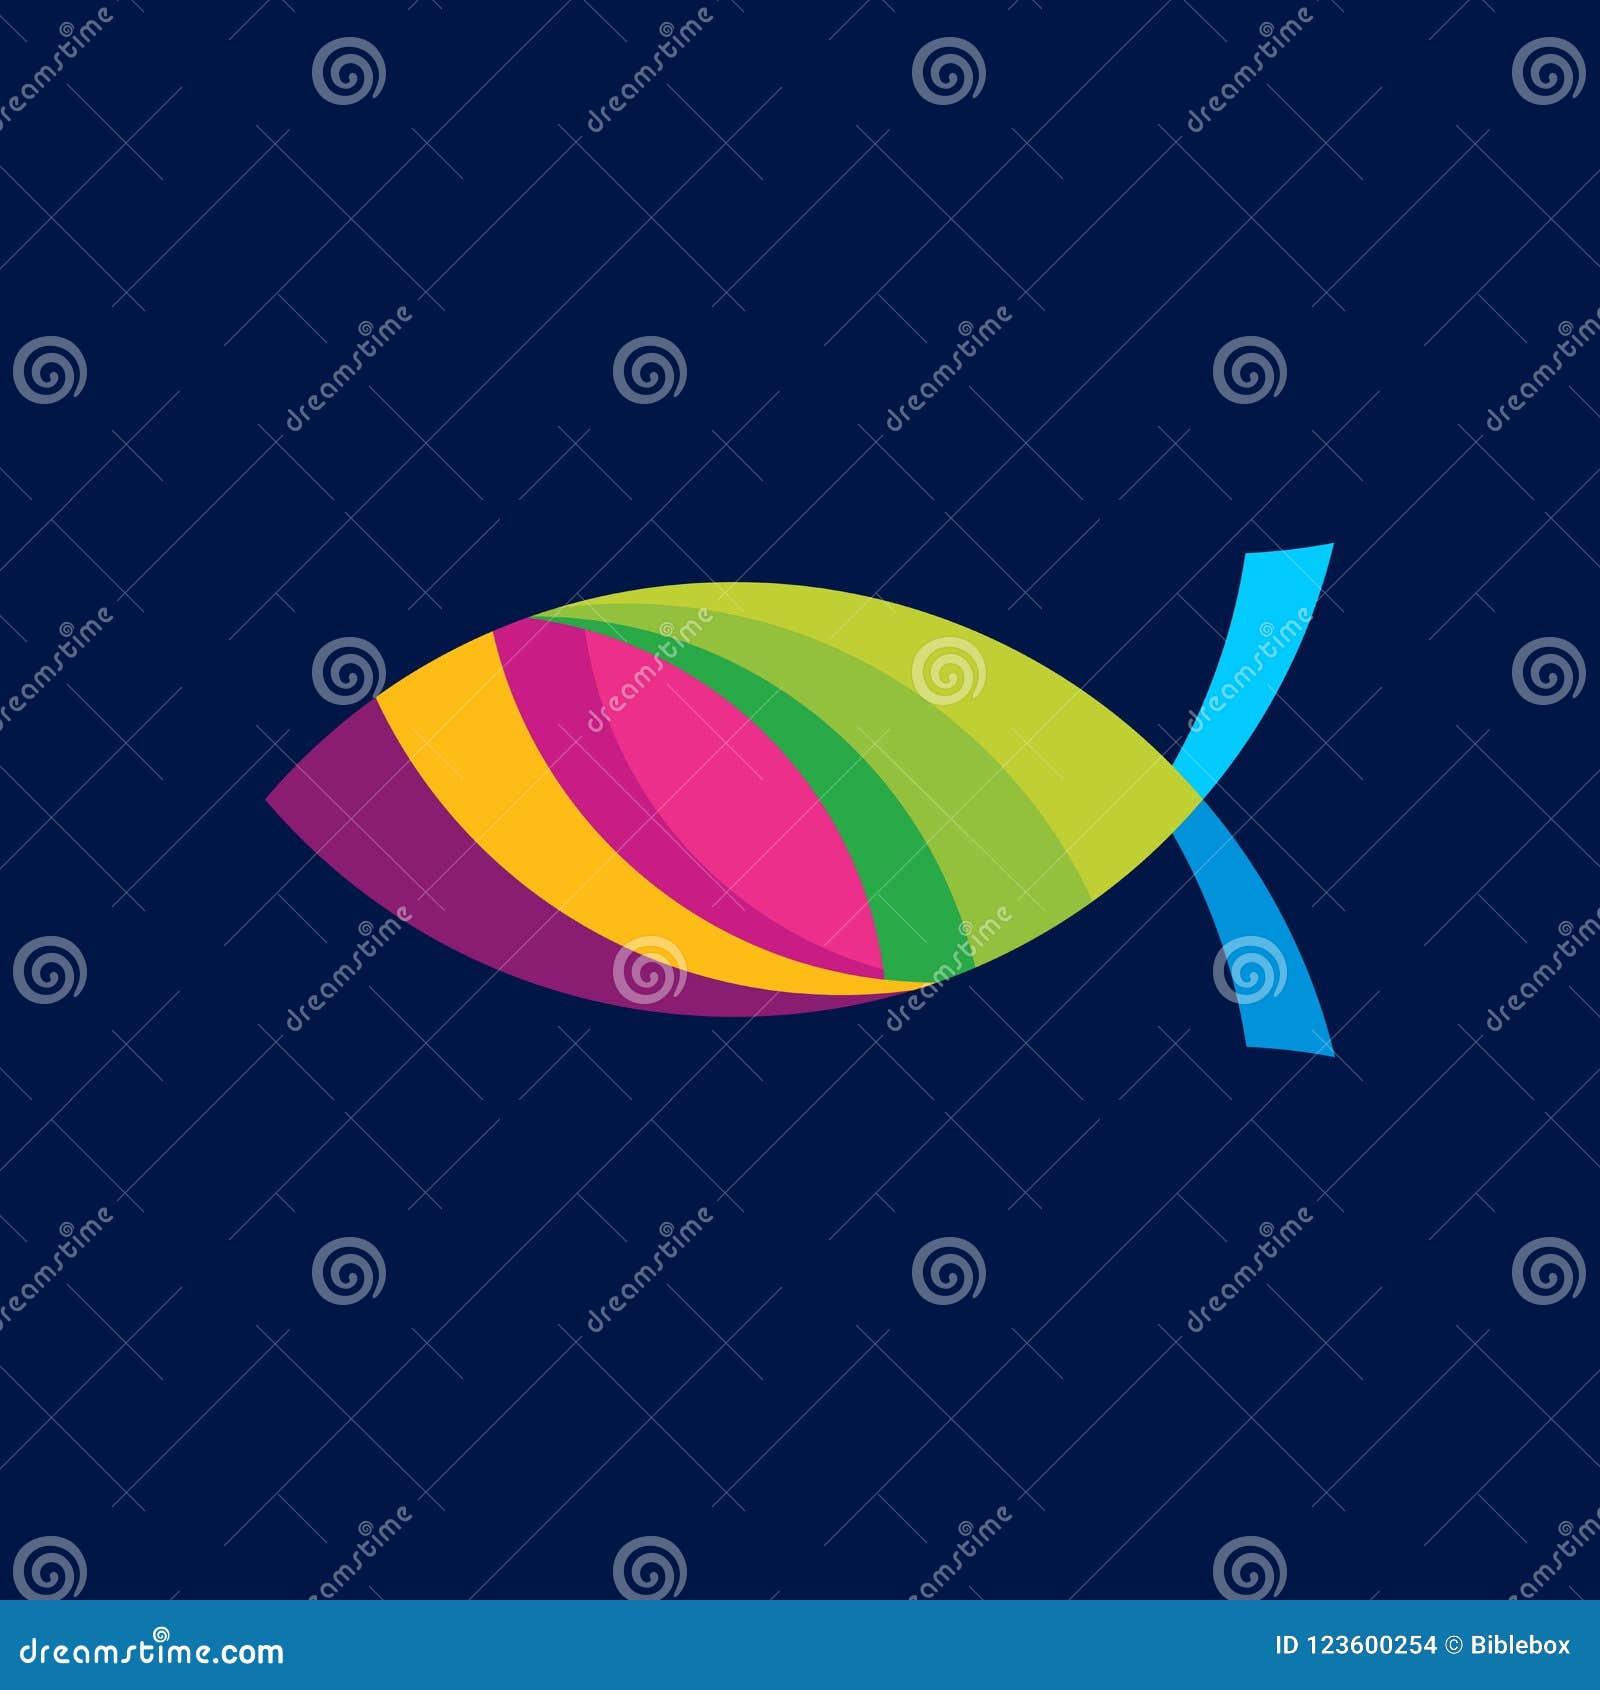 Church Logo Christian Symbols Fish The Symbol Of Jesus Christ